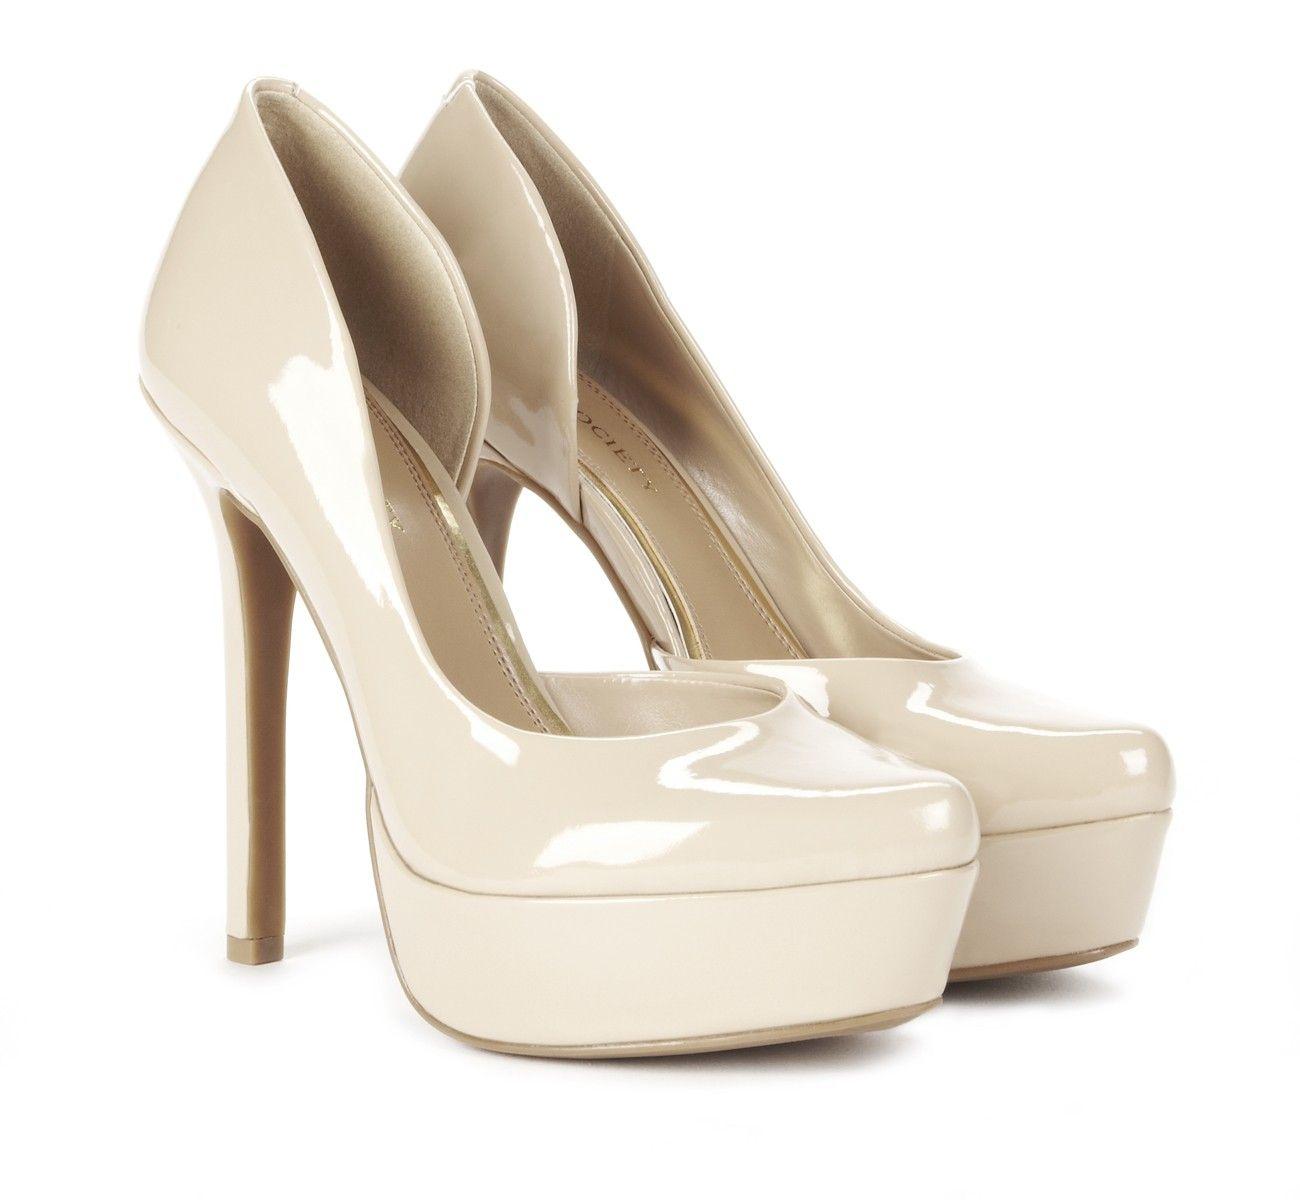 glossy white pumps!